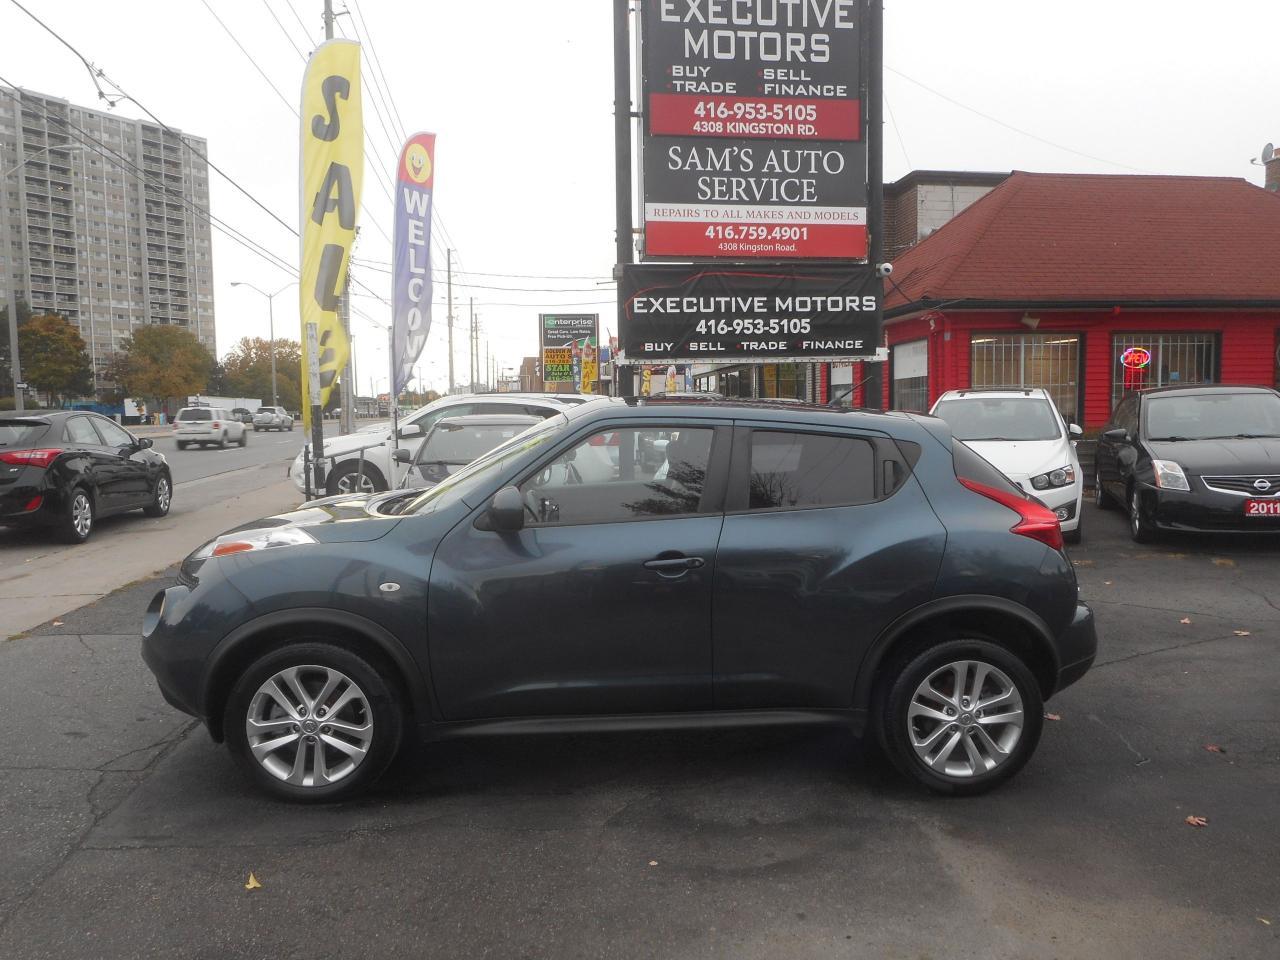 2012 Nissan Juke SL / ALLOYS/ PUSH START/ SUNROOF/ CERTIFIED /